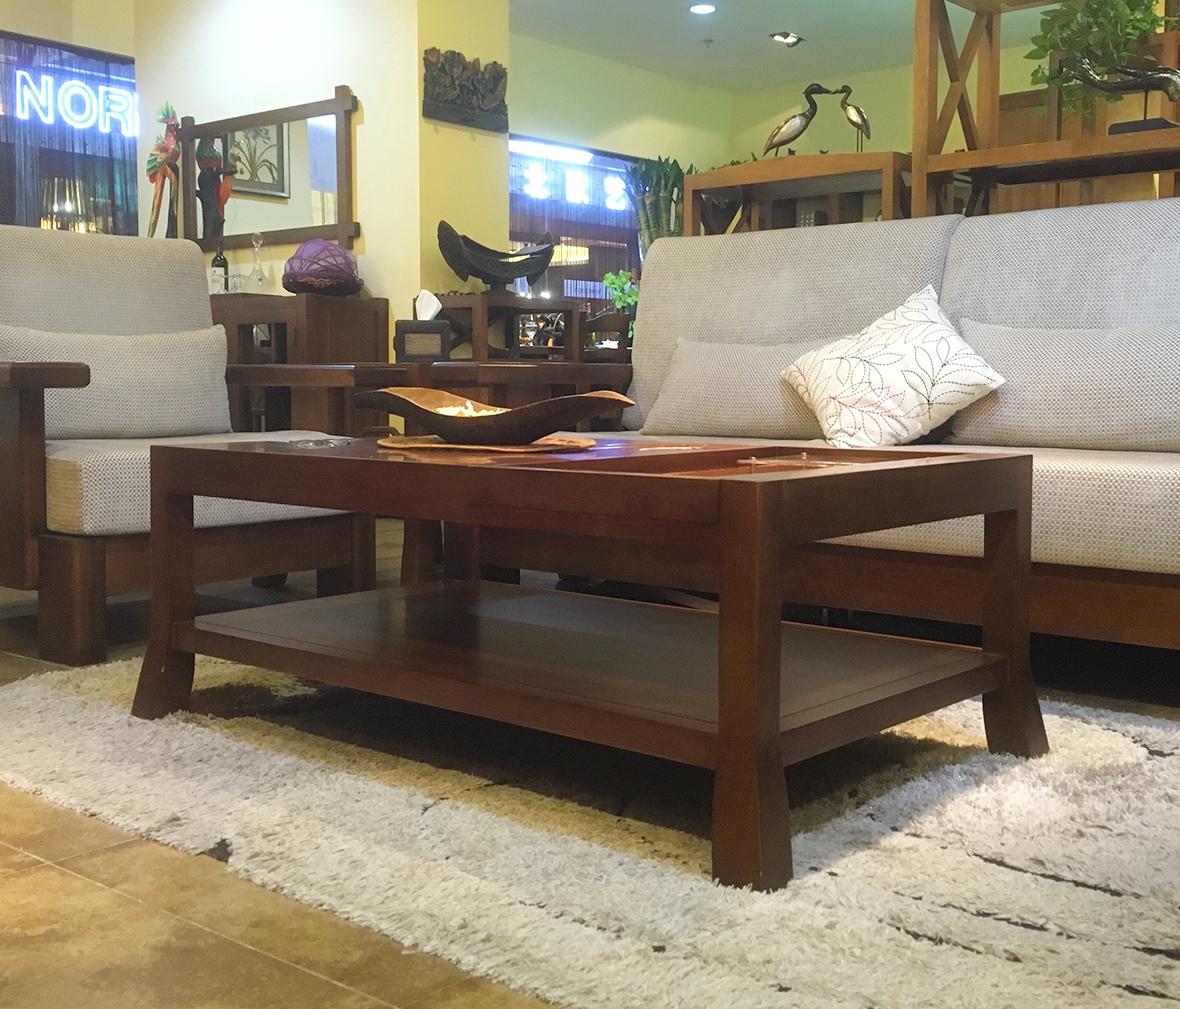 CC型号 现代中式风格楸木茶几 实木家具-迦南橄榄树 6602型号长茶